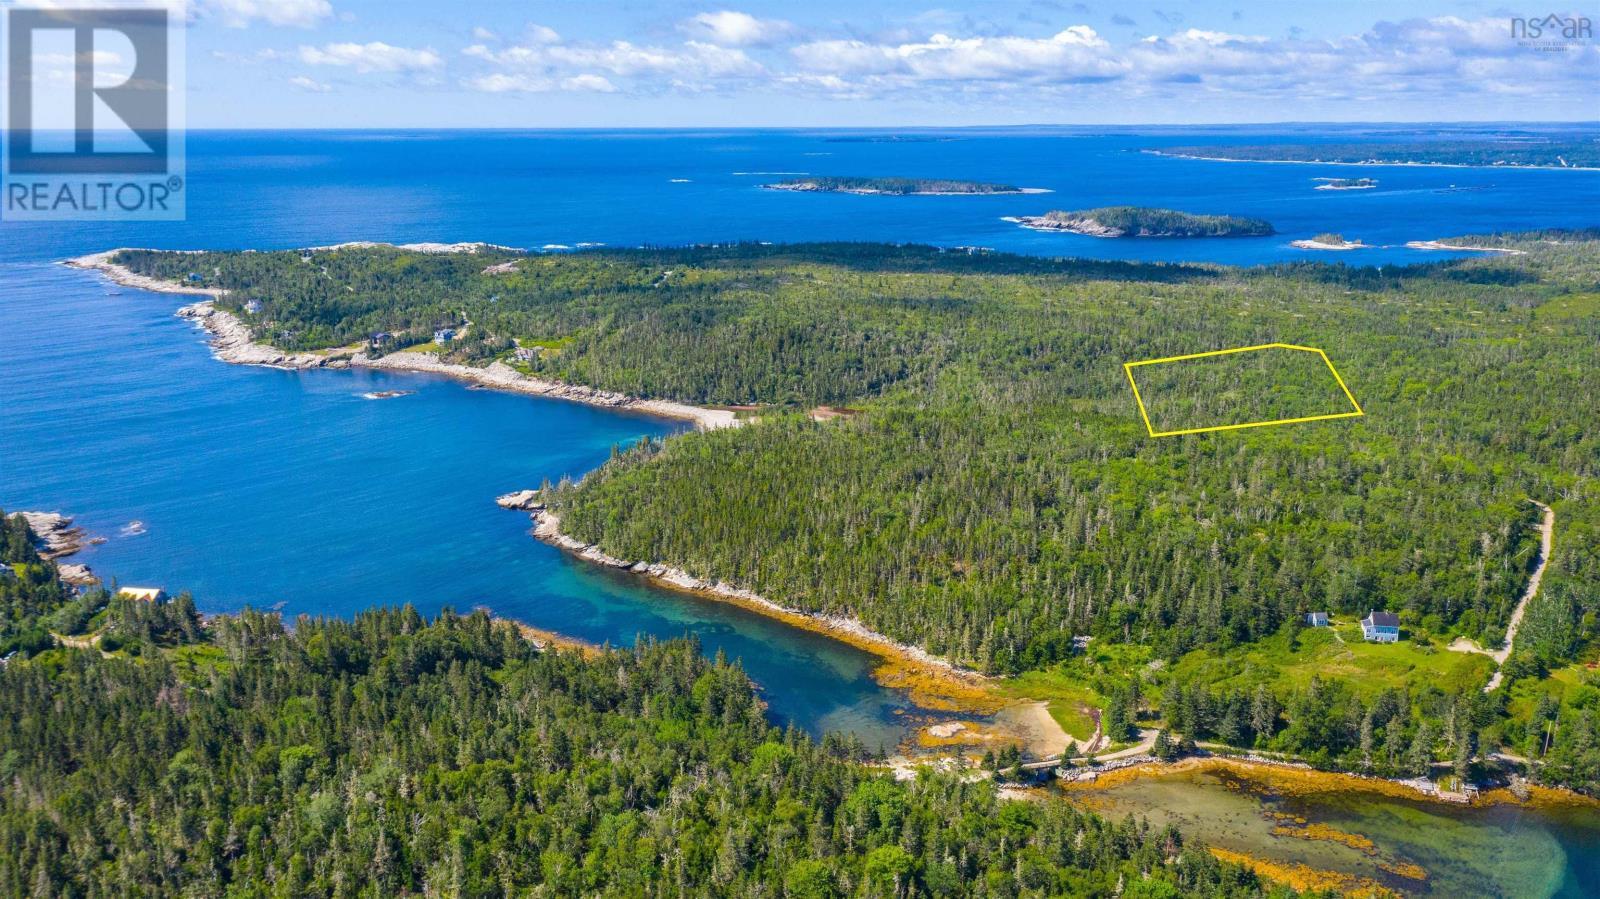 Lot W20-4 Owls Head Drive, Southwest Cove, Nova Scotia  B0J 1T0 - Photo 5 - 202125697